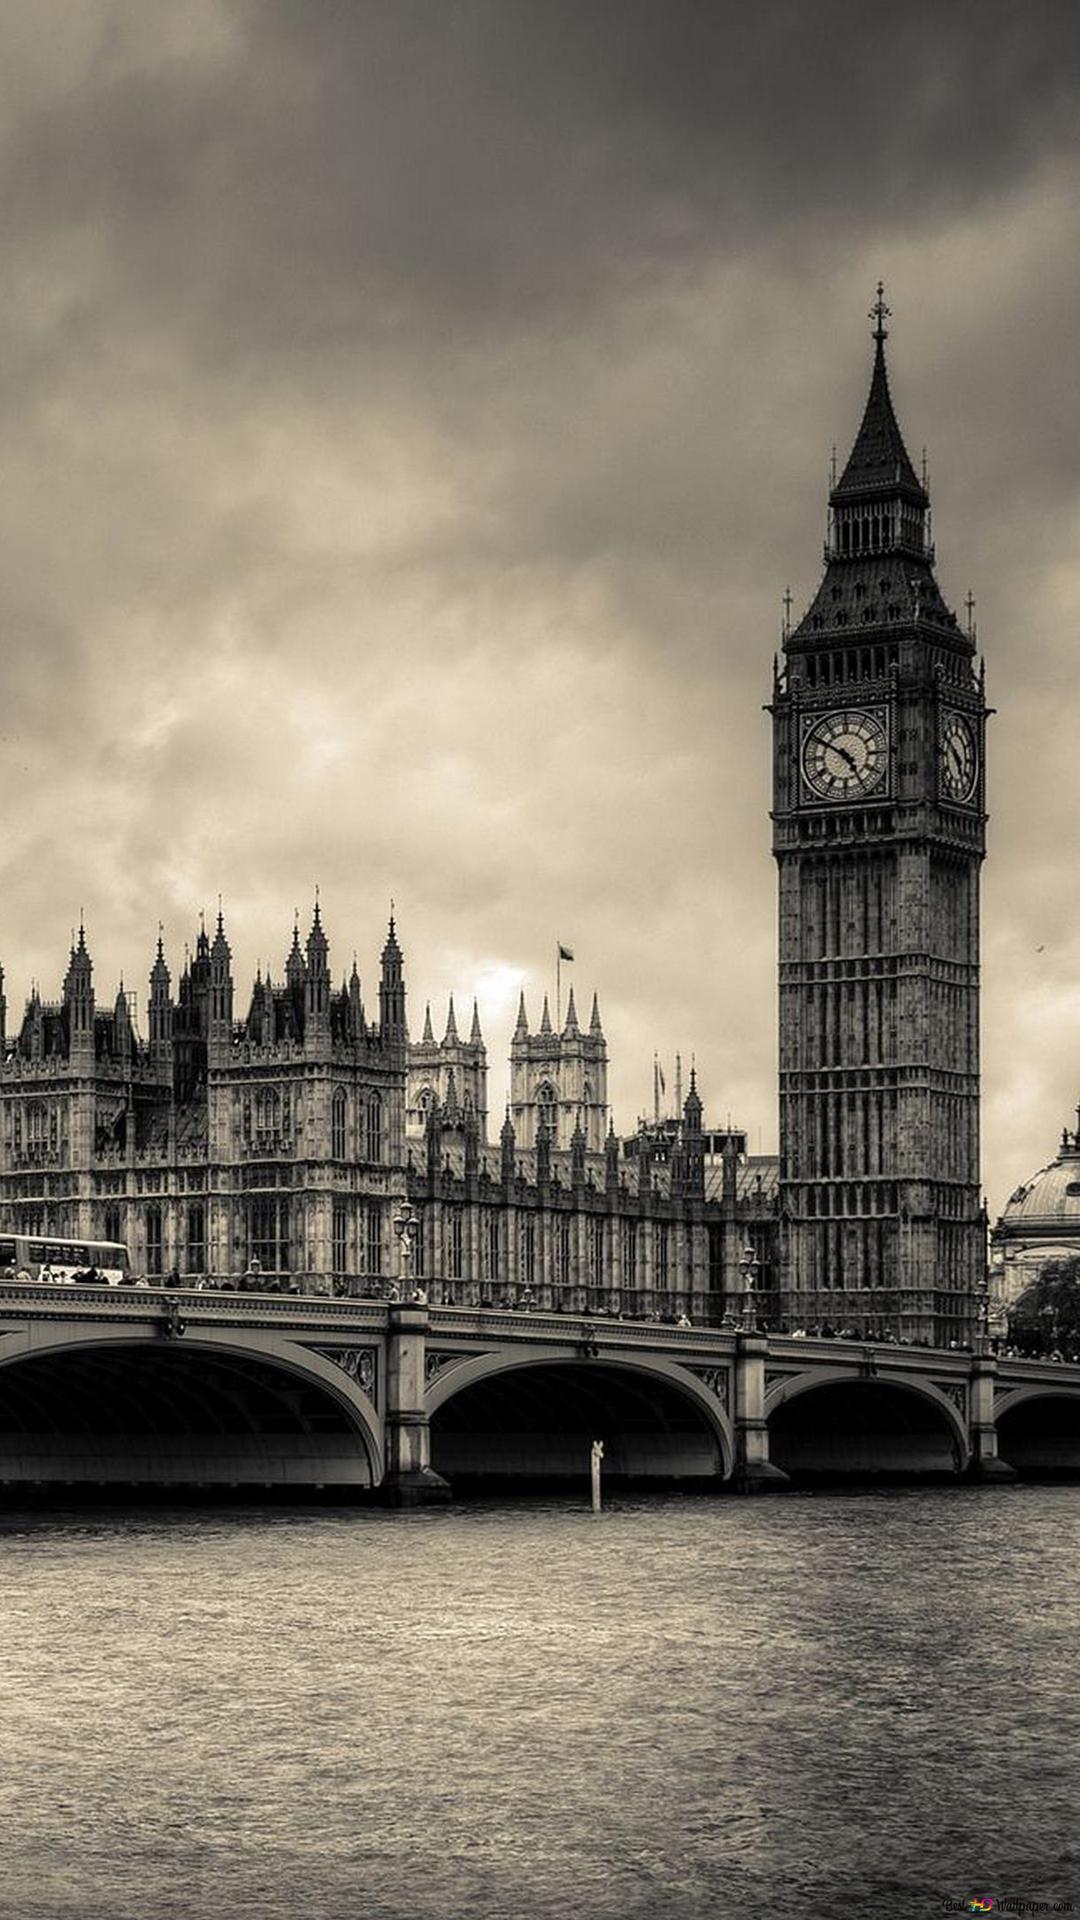 London Old Vintage City Hd Wallpaper Download